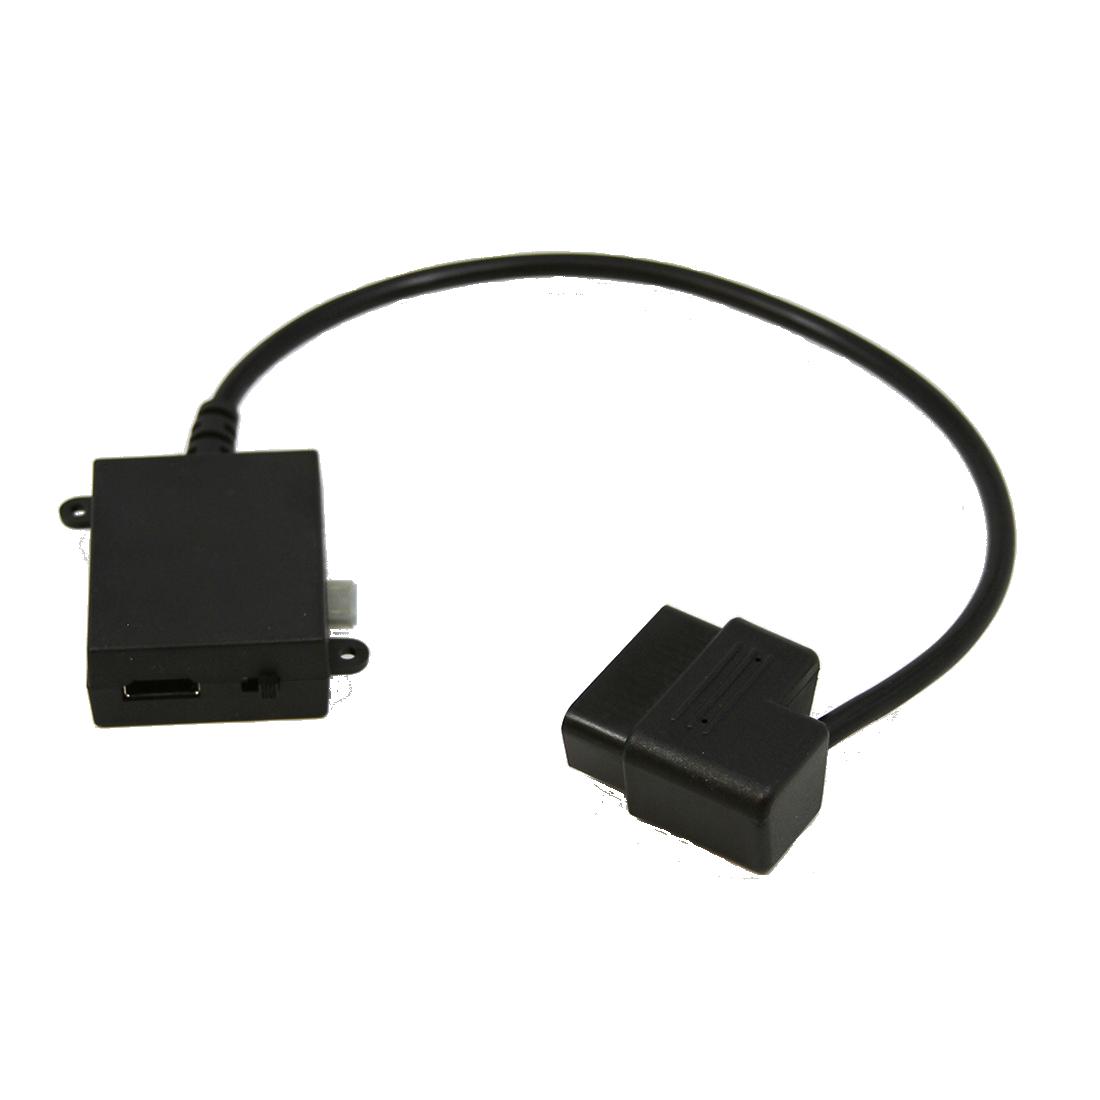 Bully Dog OBDII Power Block Adapter for Bullydog GT Tuner